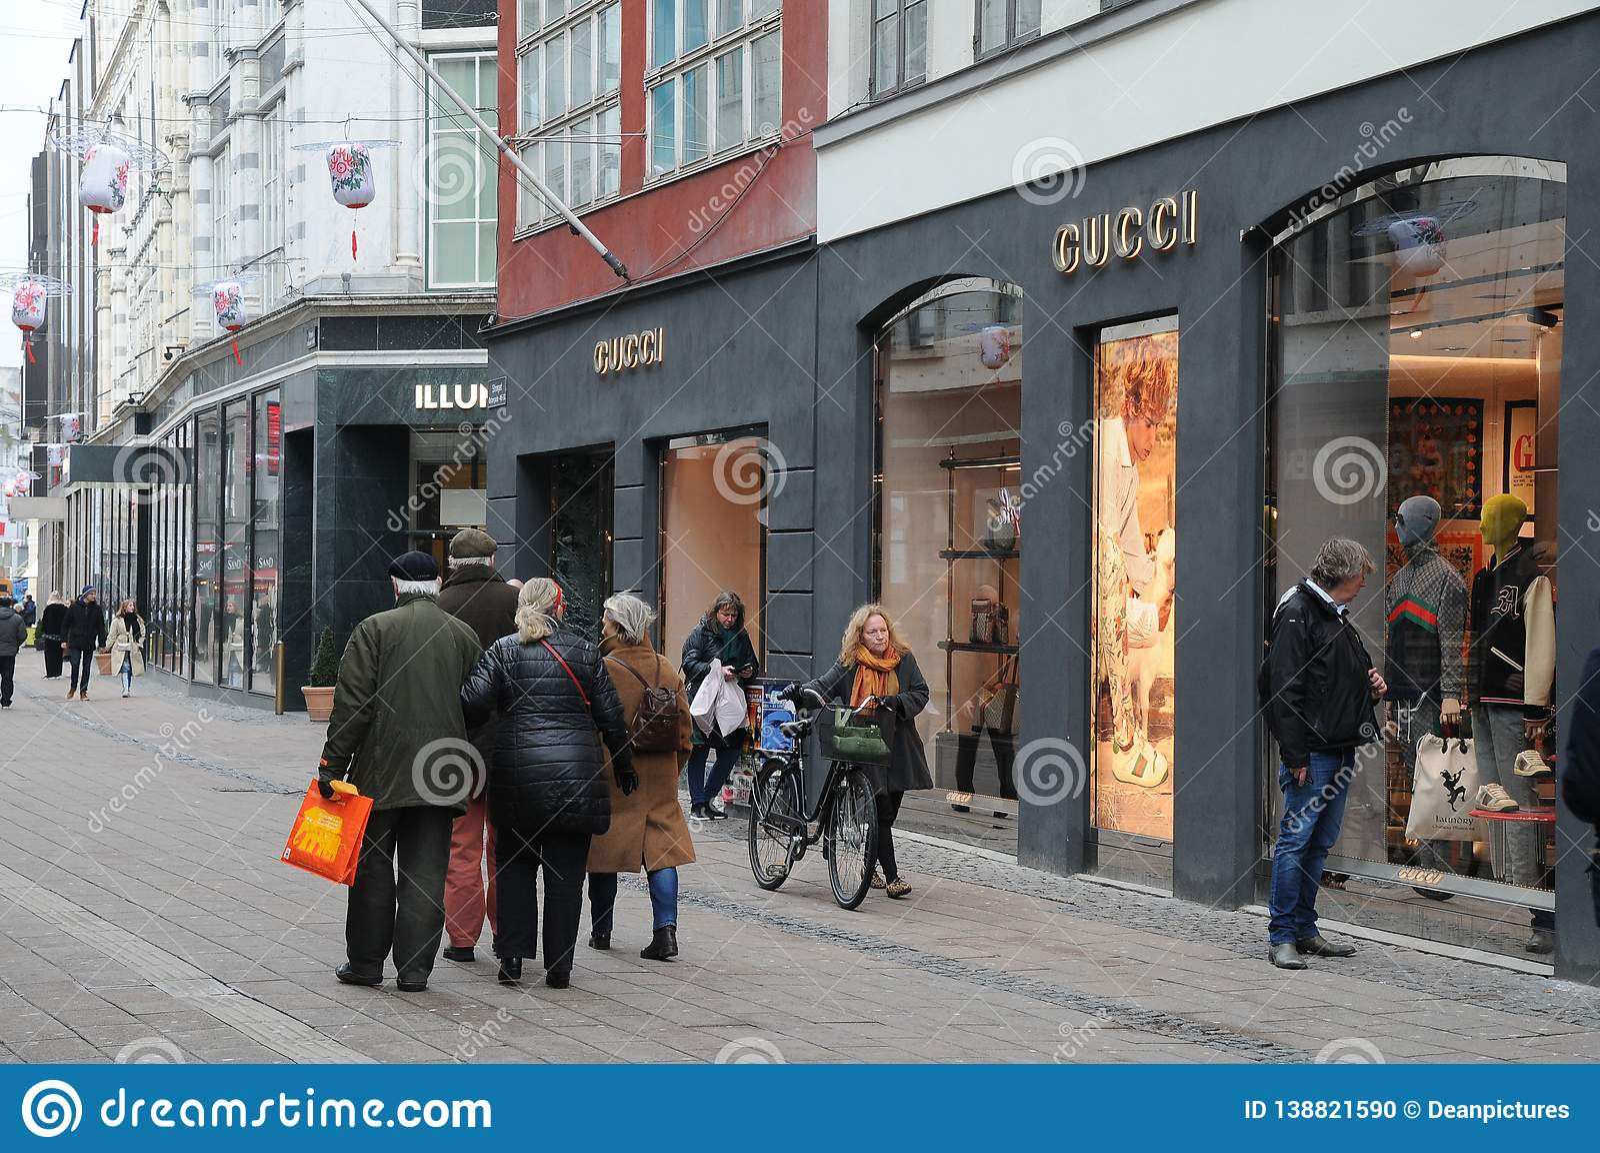 fd51ab98730 Copenhagen Denmark. 8th.Febuary Shoppers pass by Gucci store on stroeget in  danish capital Copenhagen Denmark. Photo..Francis Joseph Dean   Deanpictures